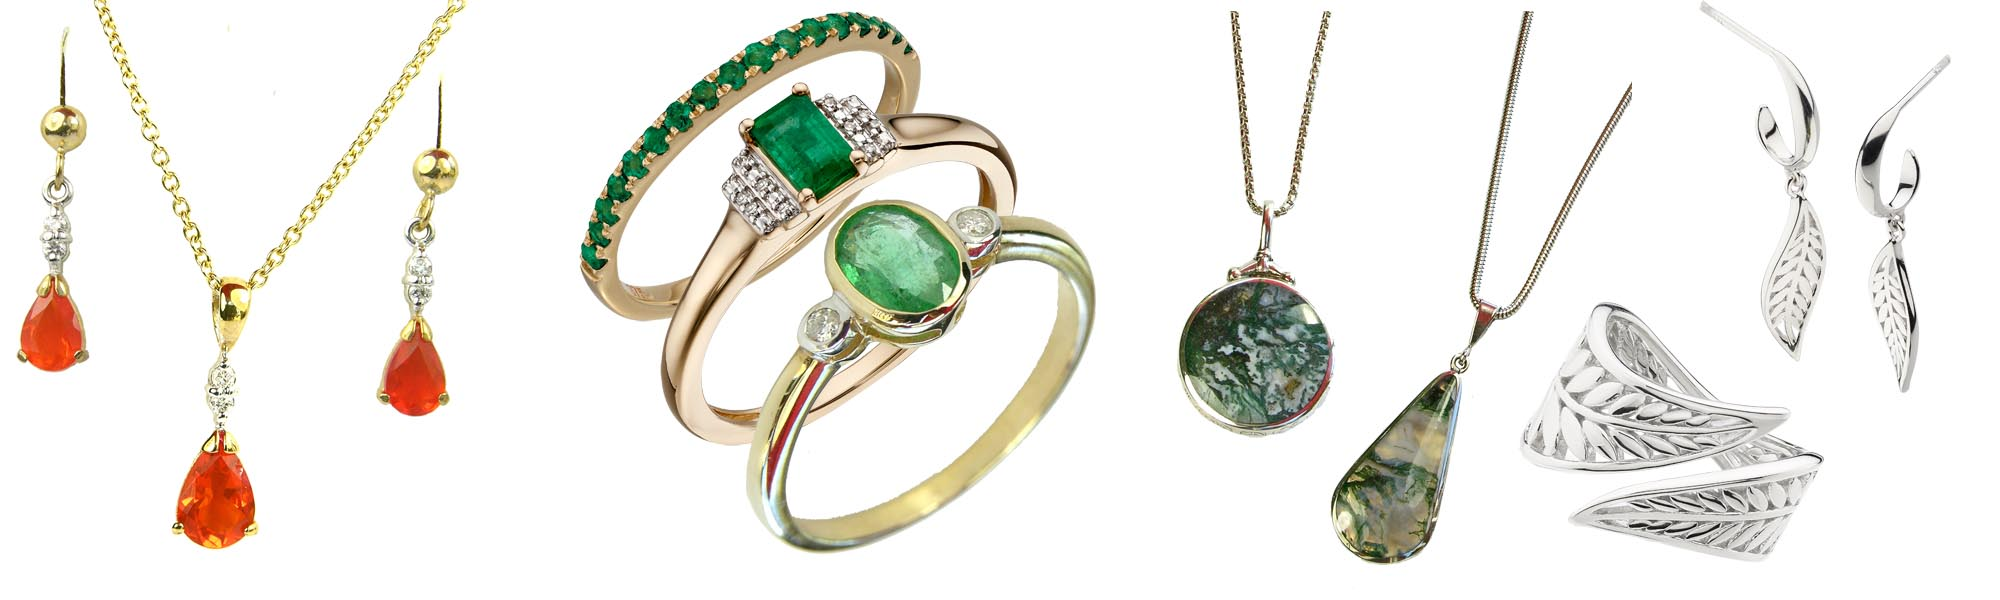 Sally Thornton Jewellery blog on Autumn Inspiration from Thornton Jewellers Kettering Northampton